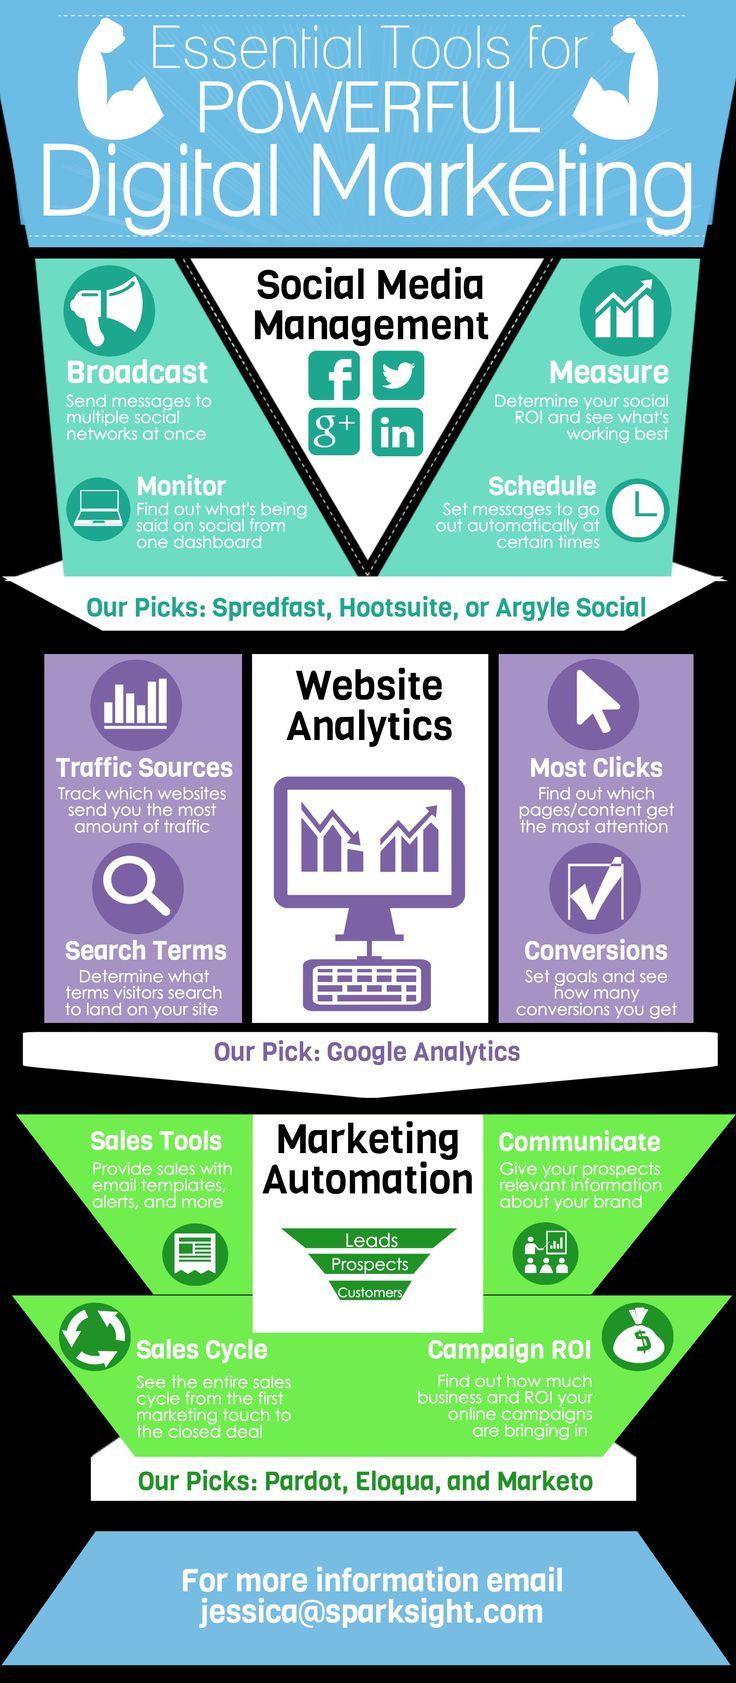 Essential Tools for Powerful Digital Marketing